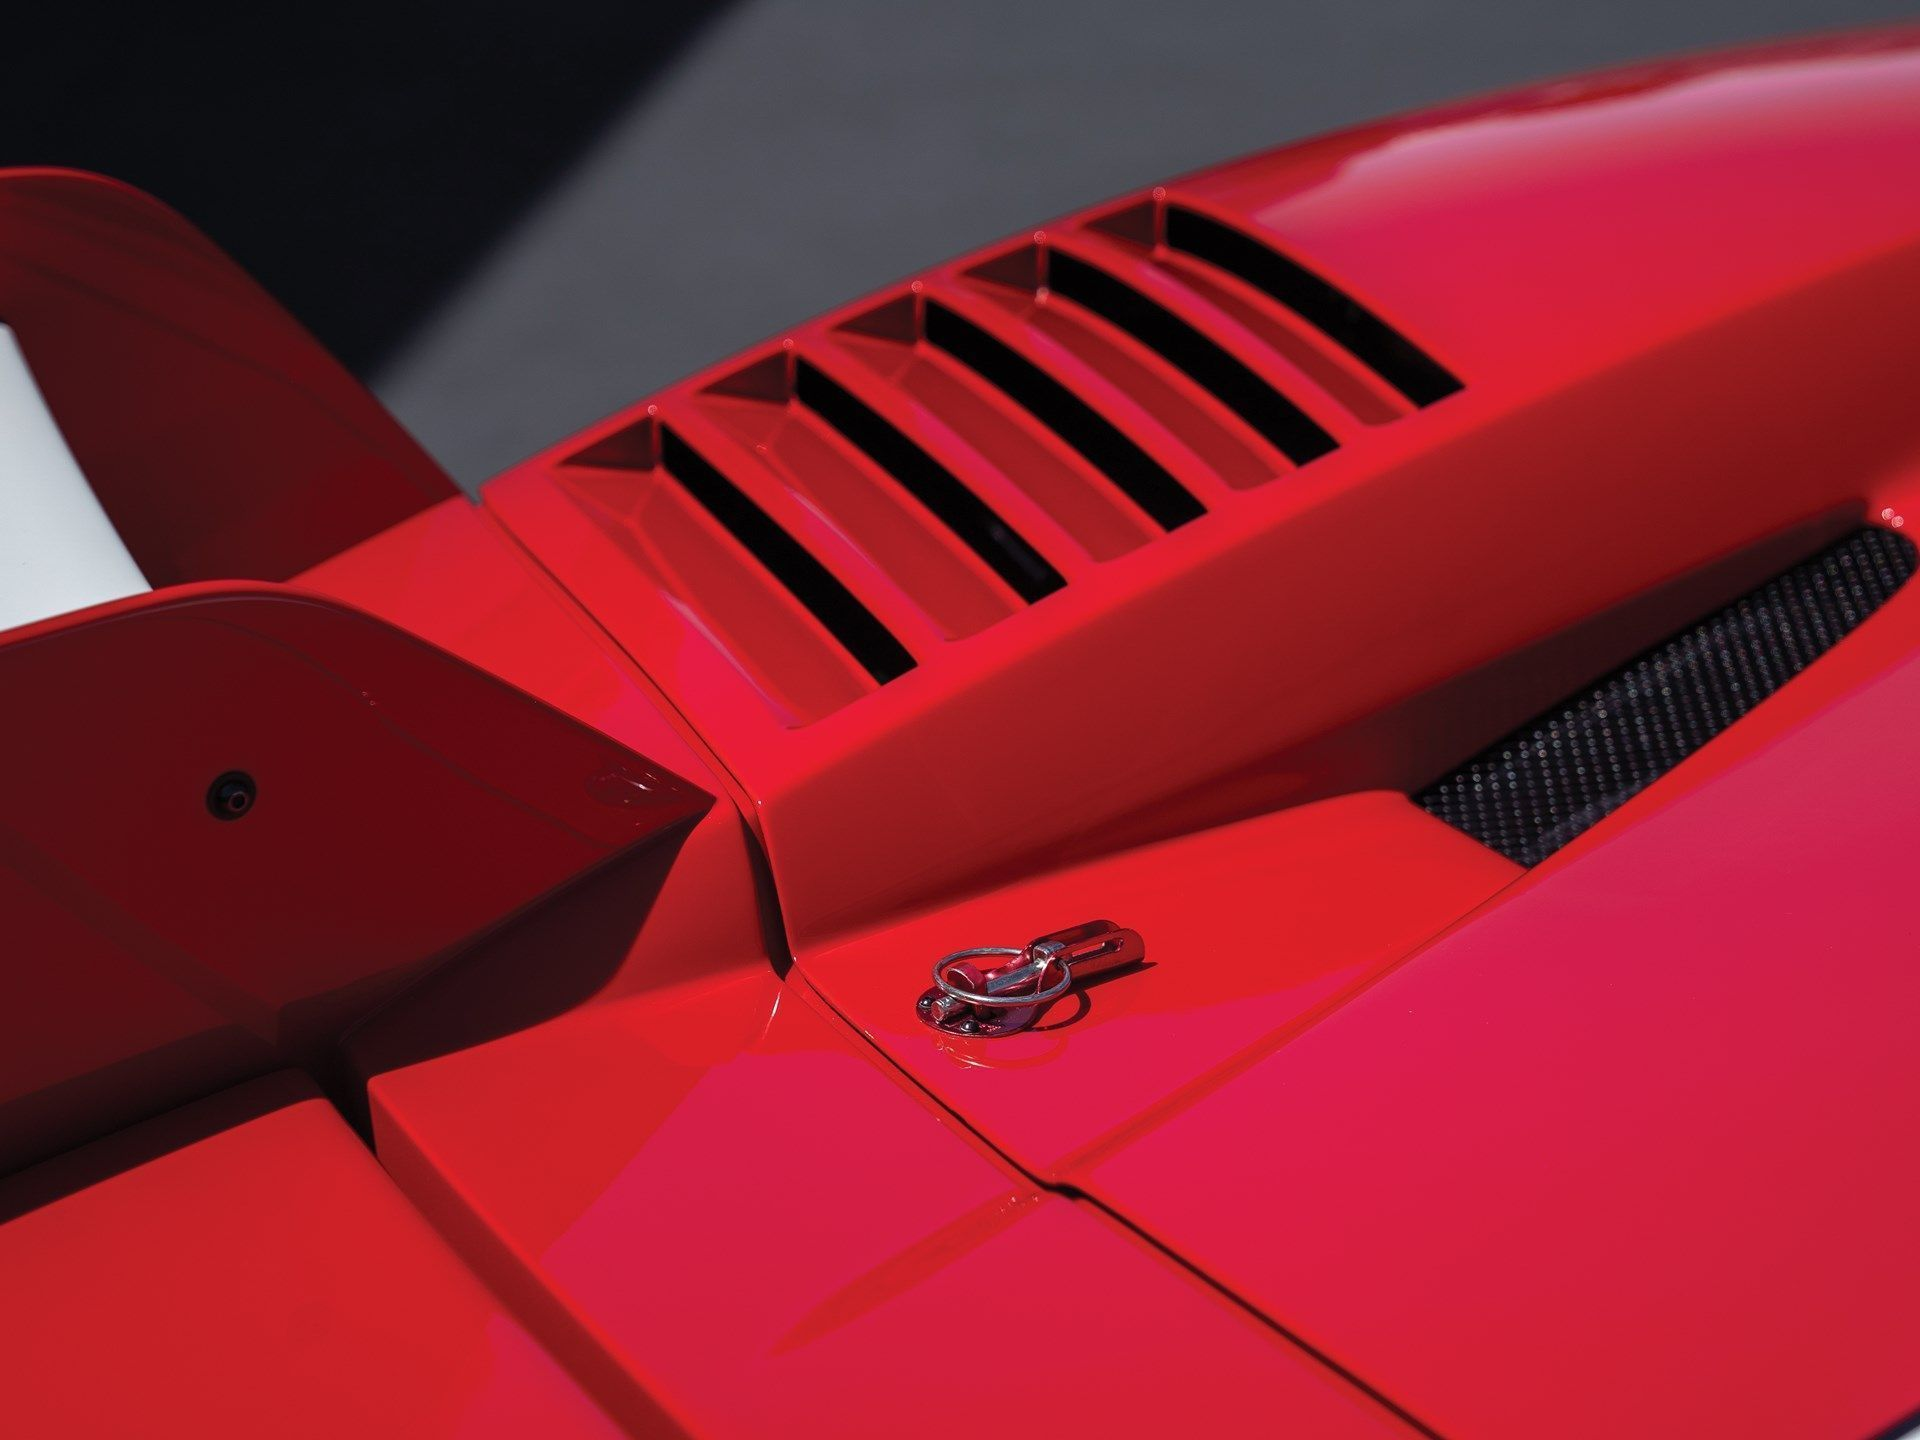 2006 Ferrari FXX #ferrarifxx 2006 Ferrari FXX #ferrarifxx 2006 Ferrari FXX #ferrarifxx 2006 Ferrari FXX #ferrarifxx 2006 Ferrari FXX #ferrarifxx 2006 Ferrari FXX #ferrarifxx 2006 Ferrari FXX #ferrarifxx 2006 Ferrari FXX #ferrarifxx